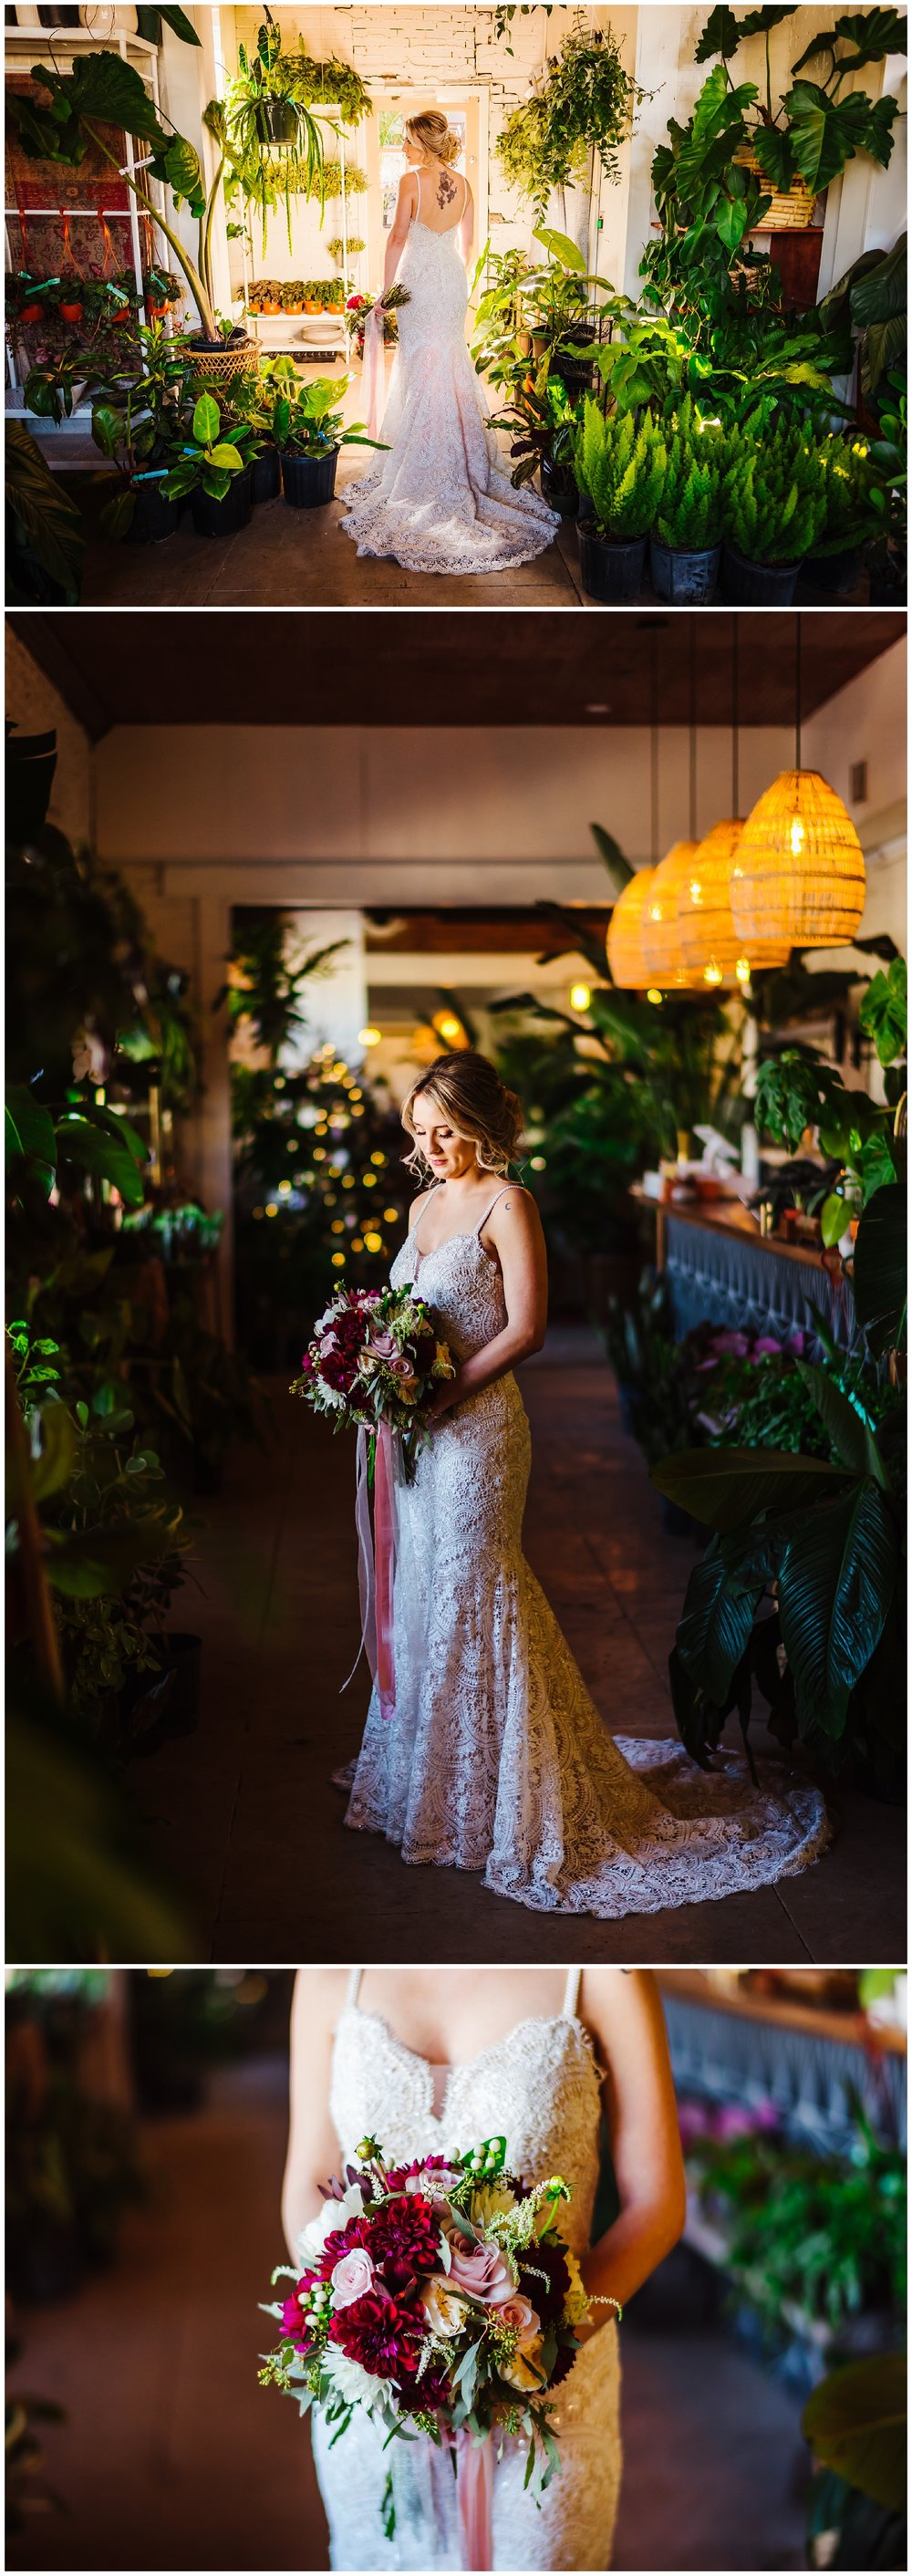 tampa-armeture-wedding-photographer-edgy-industrial-downtown-fancy-free-nursery-tattoo-burgandy-velvet_0027.jpg